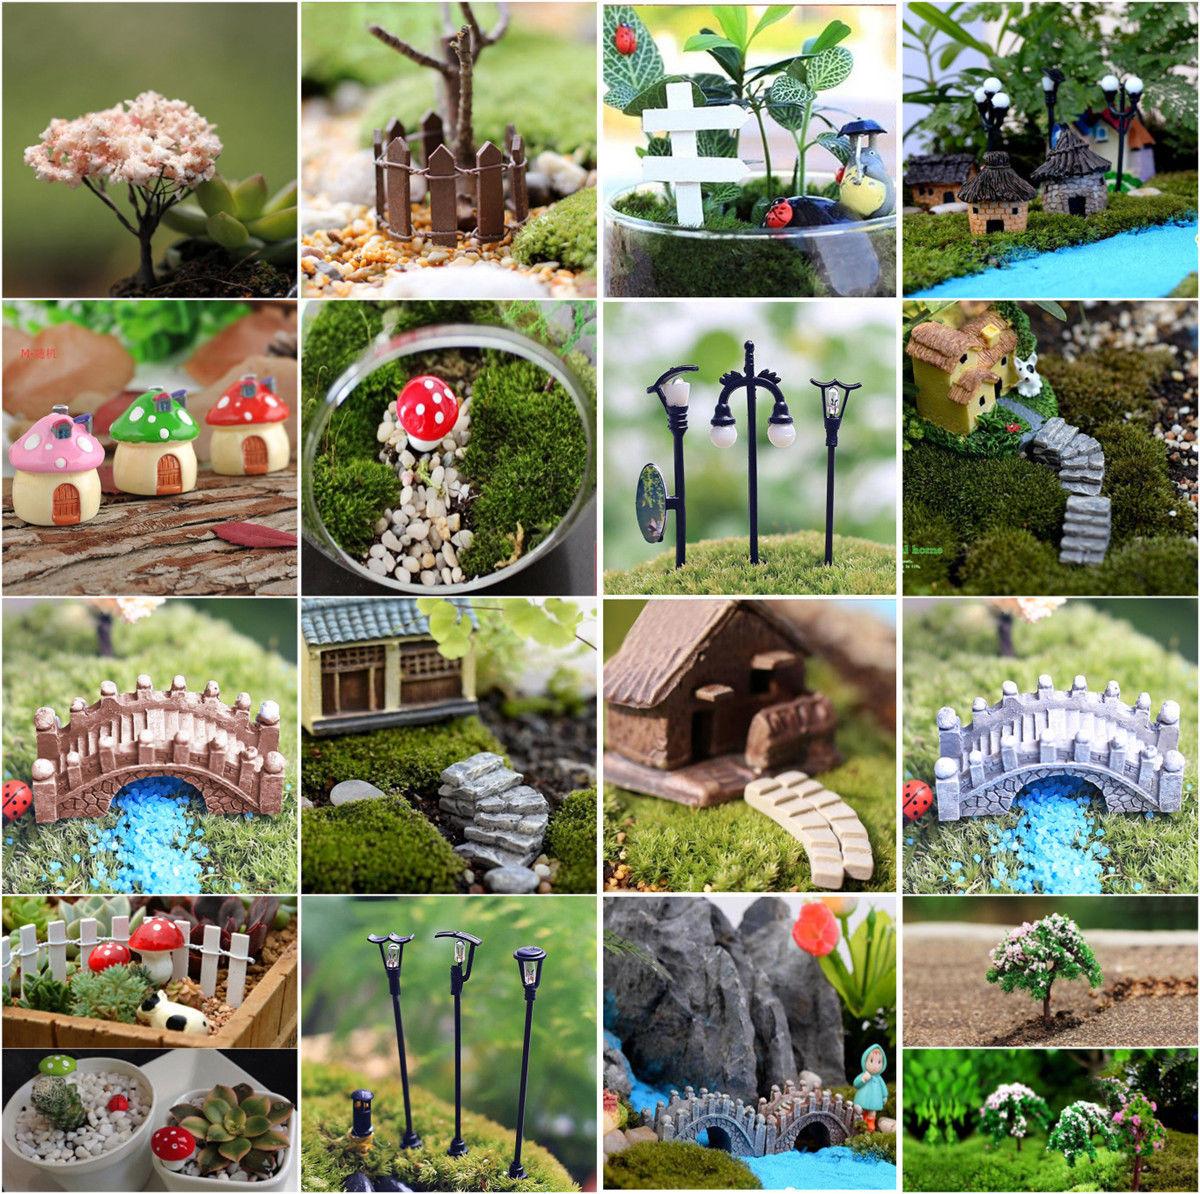 Mini Sdivaight Bending Bridge House Mushrooms Fence Craft Figurine Plant Pot Garden Ornament Miniature DIY Fairy Garden Supplies